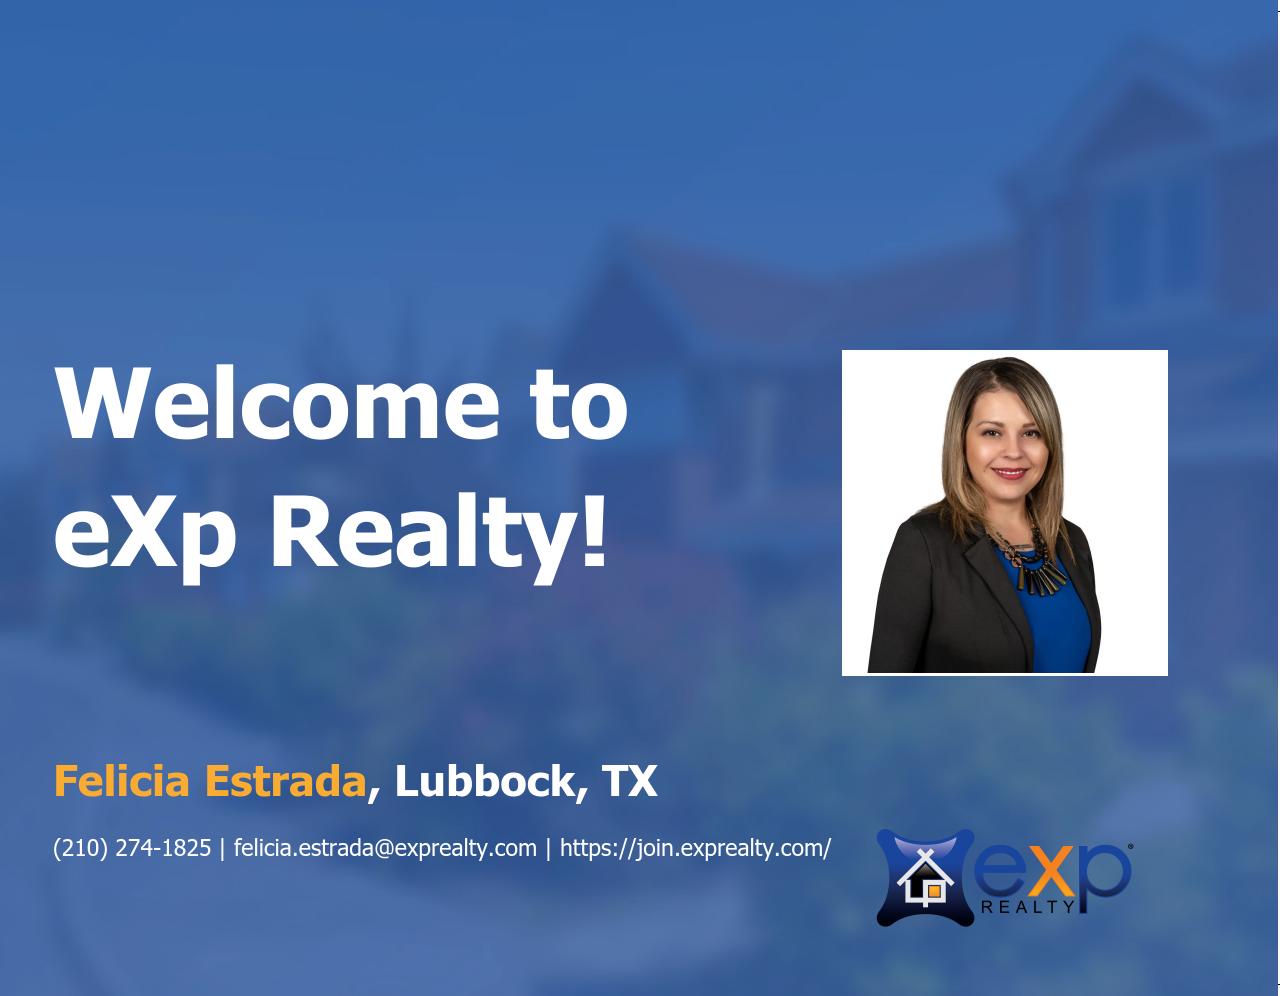 Felicia Estrada Joined eXp Realty!